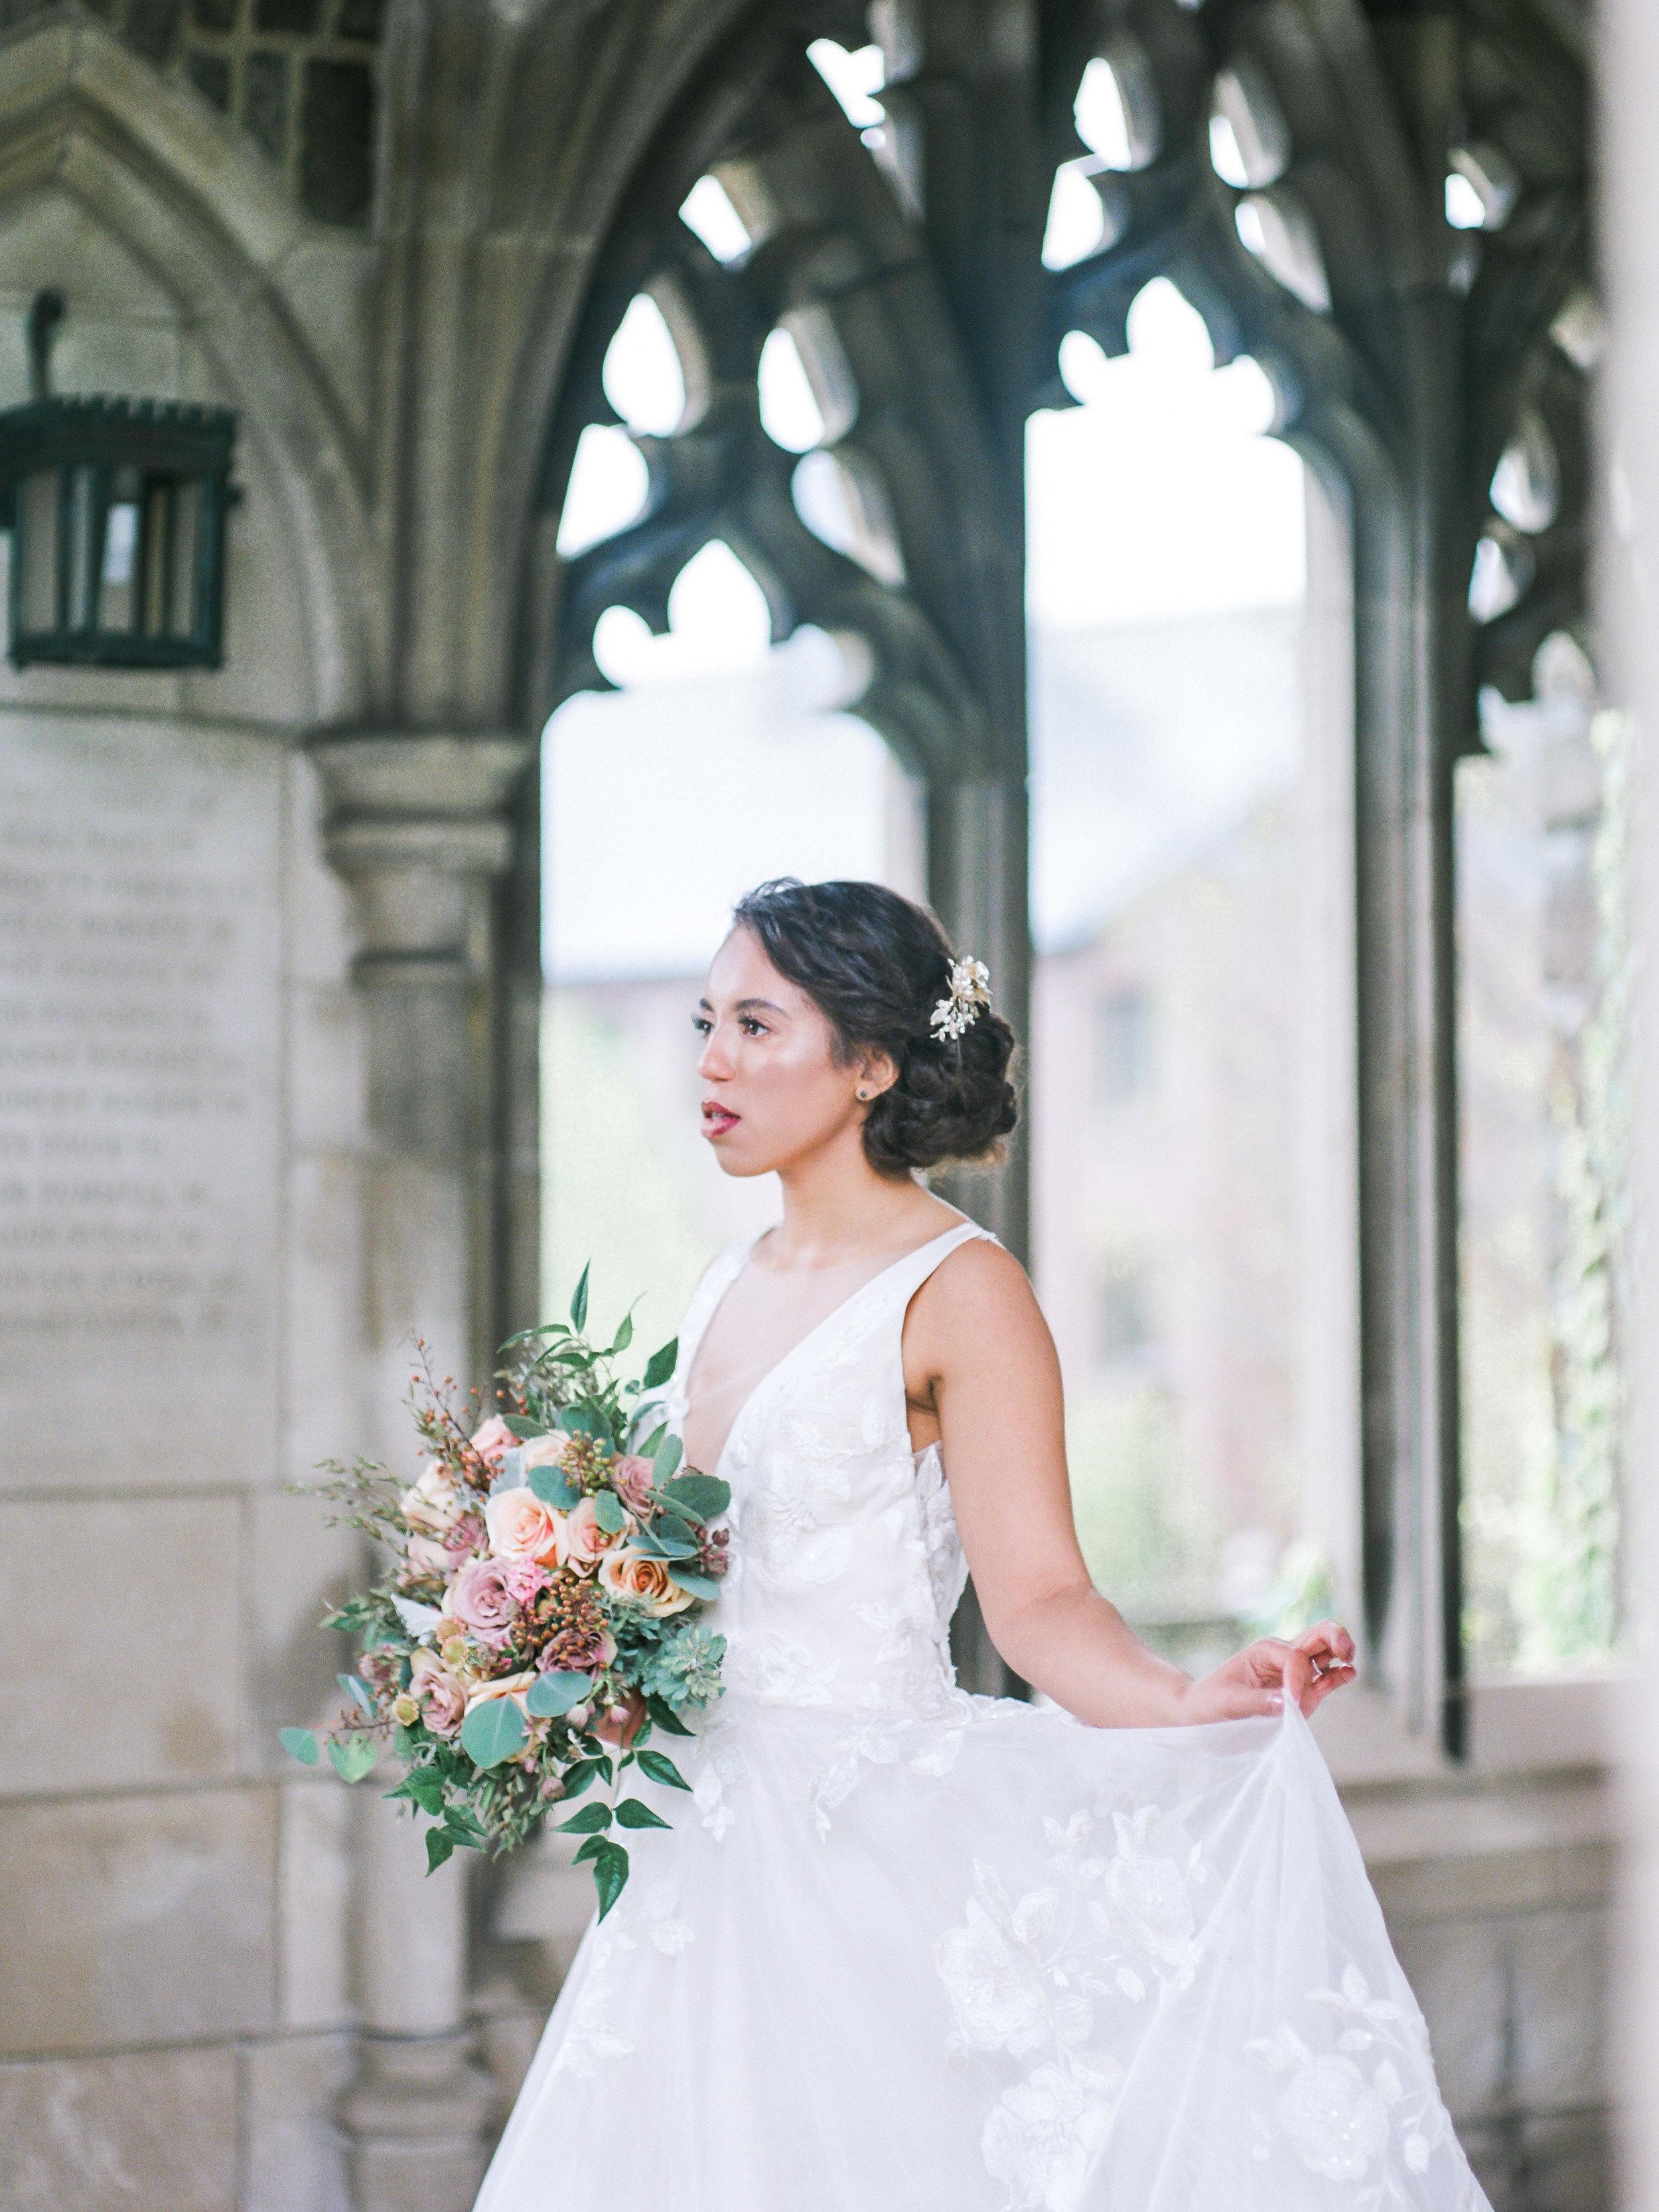 Ithaca New York-Brides Story-Manda Weaver-Wedding-12.jpg